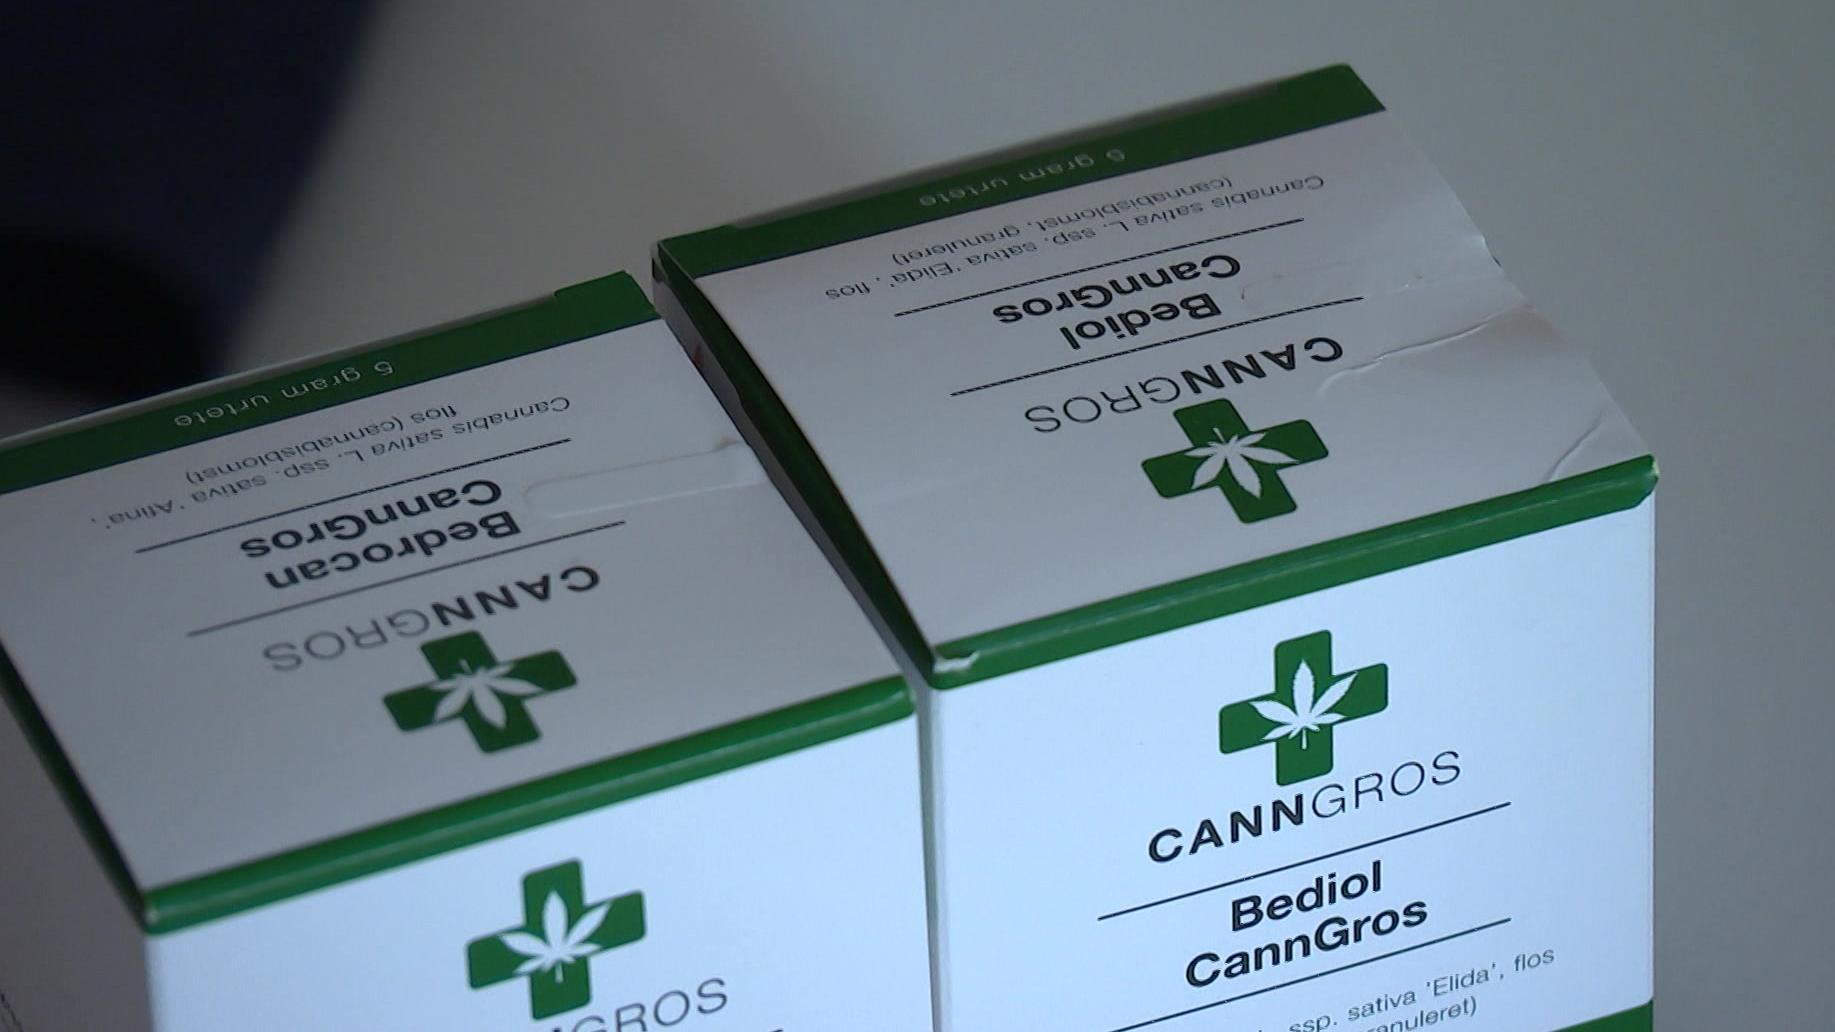 9675899_liqu_sekvens_indland_medicinsk_cannabis_case_hq-00.16.15.13.jpg